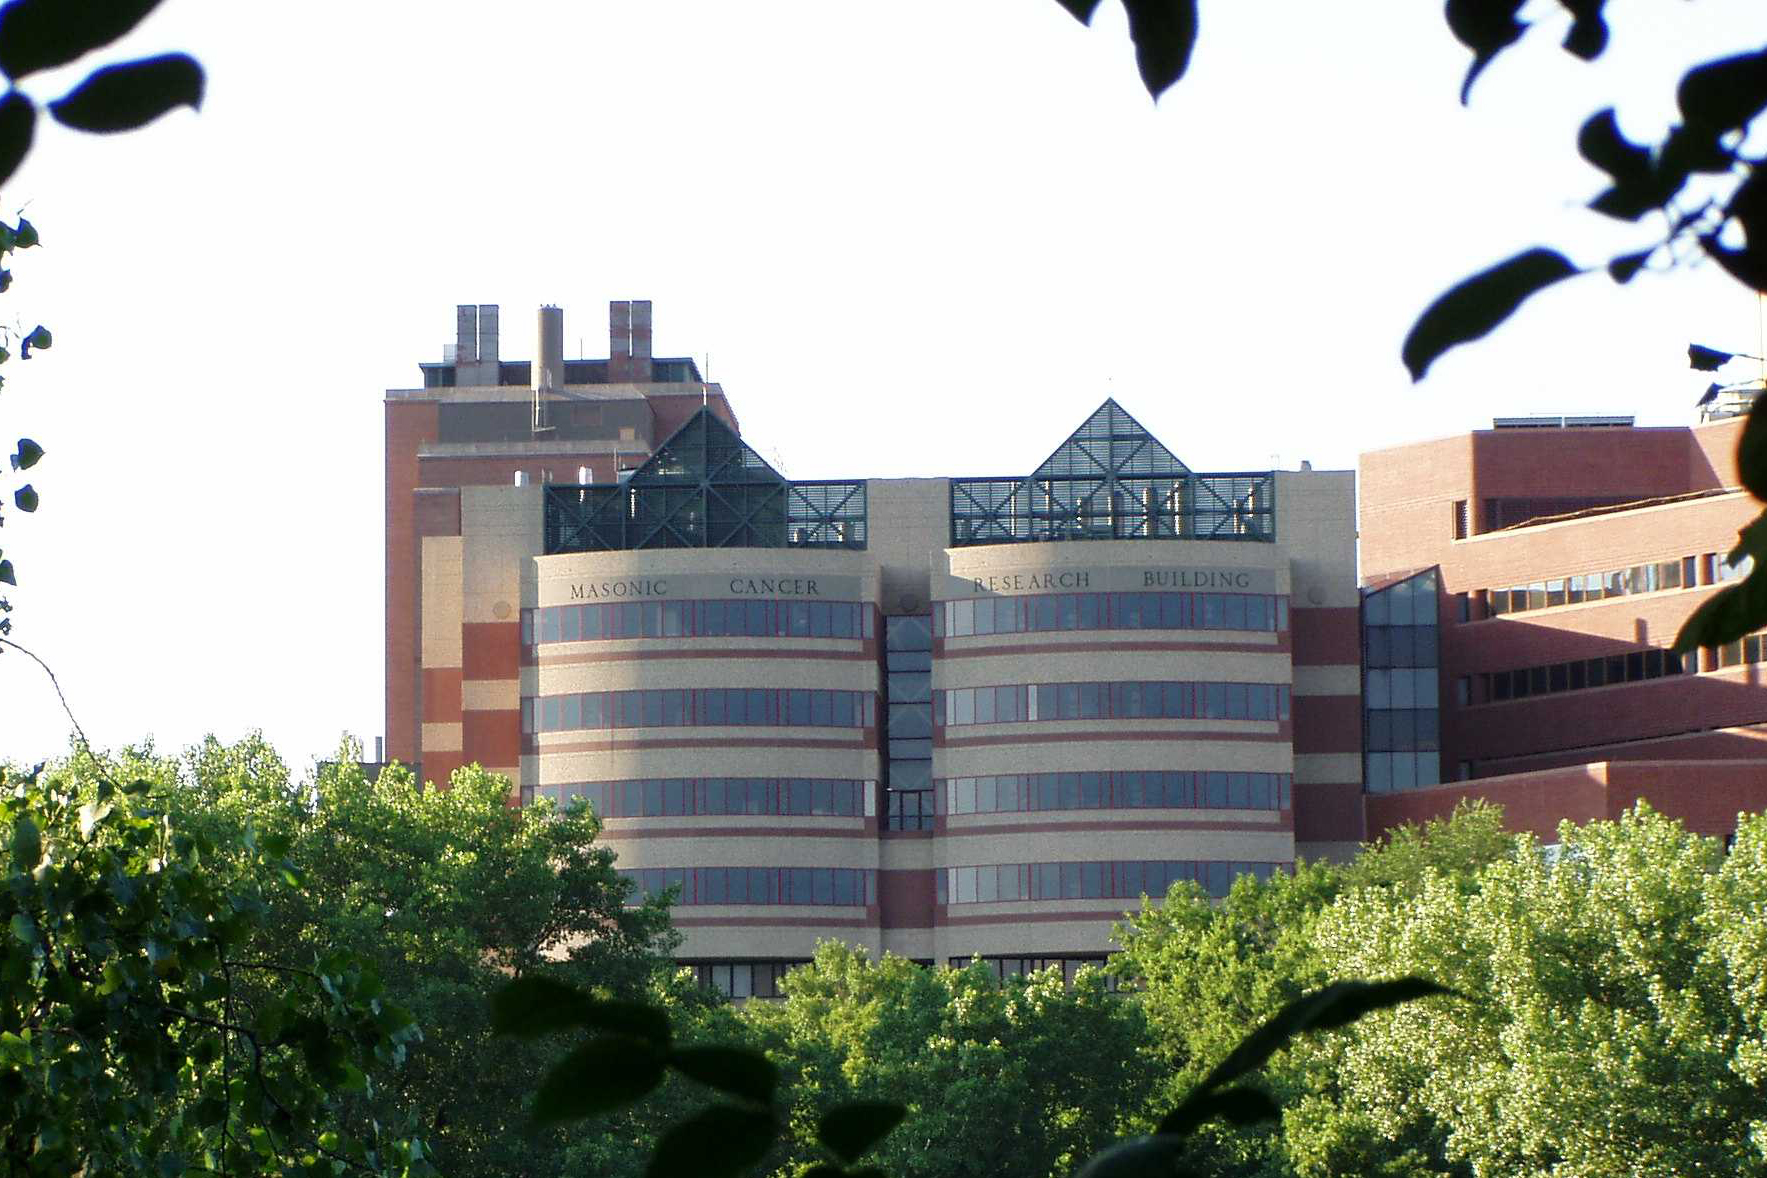 Masonic Cancer Center